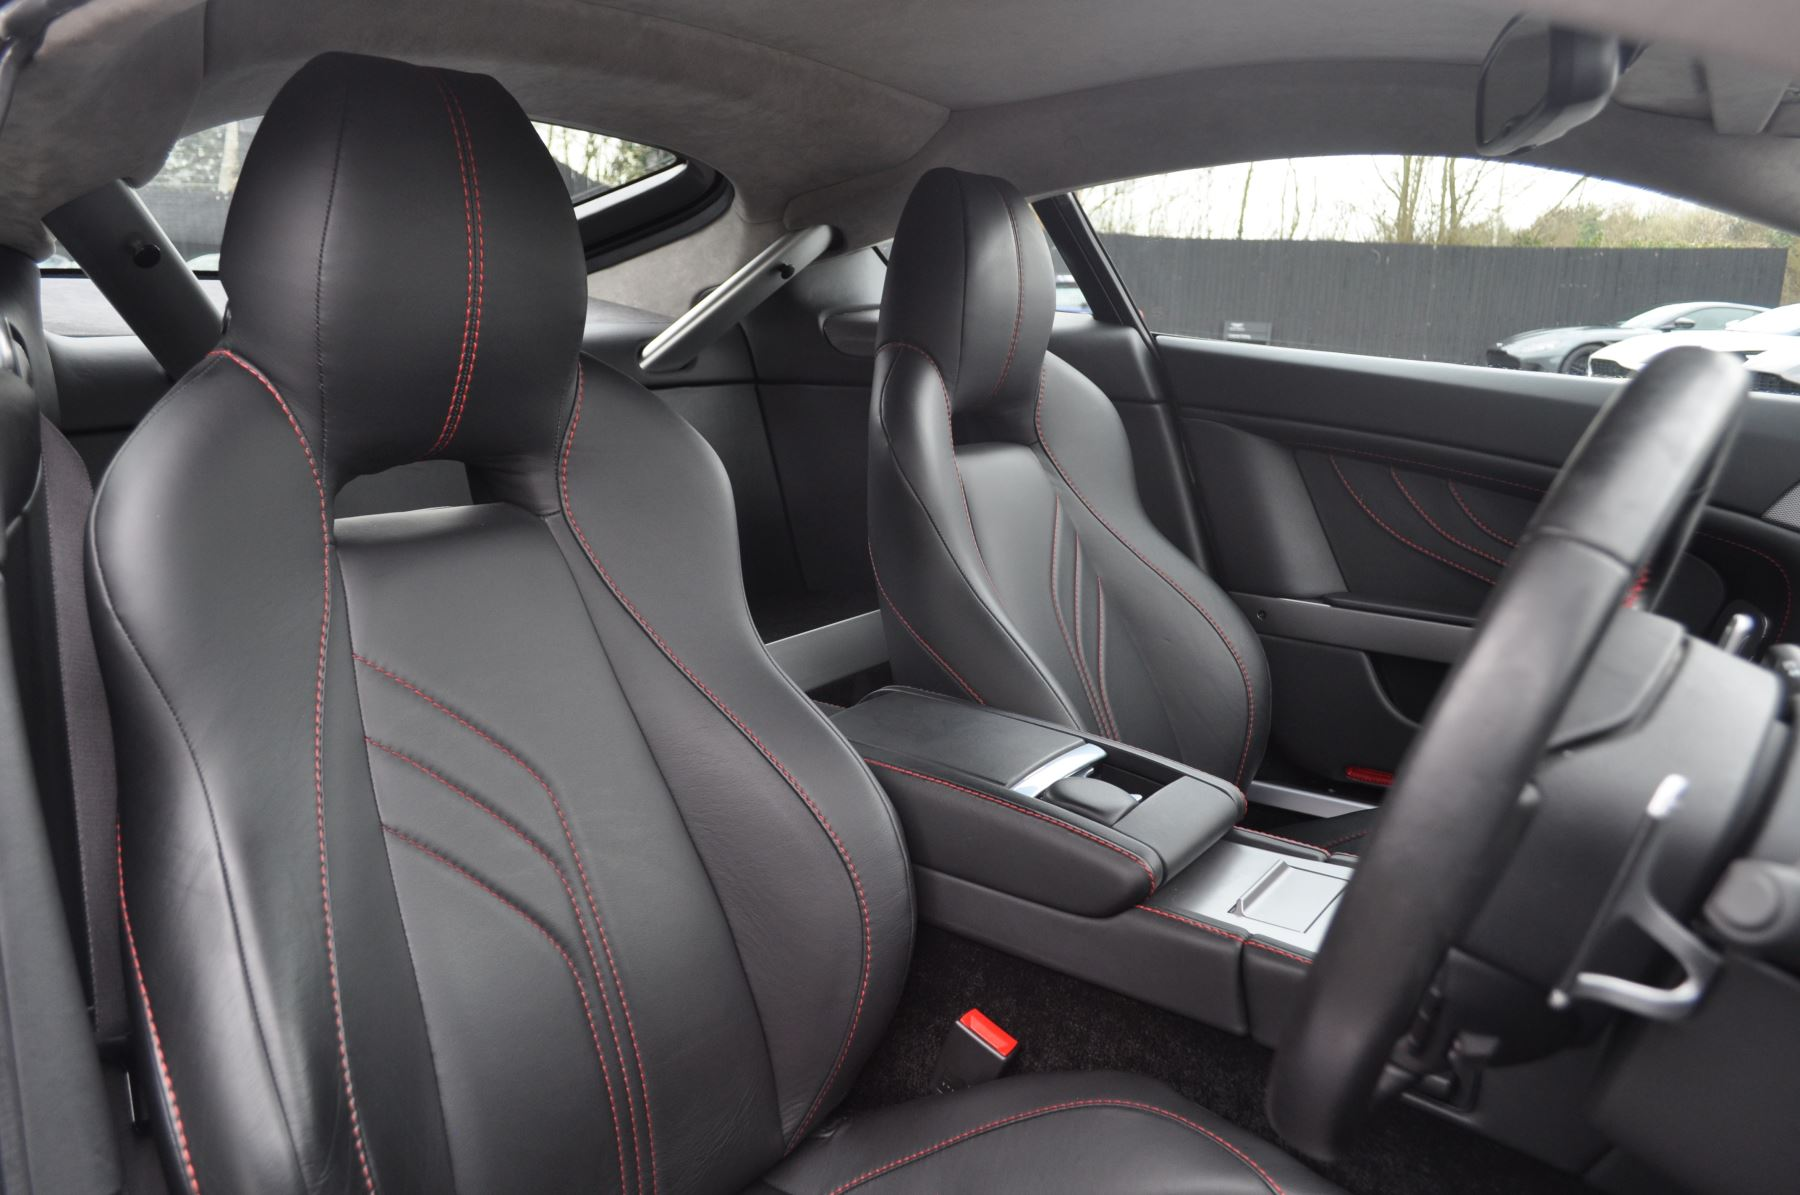 Aston Martin V8 Vantage S Coupe Coupe image 26